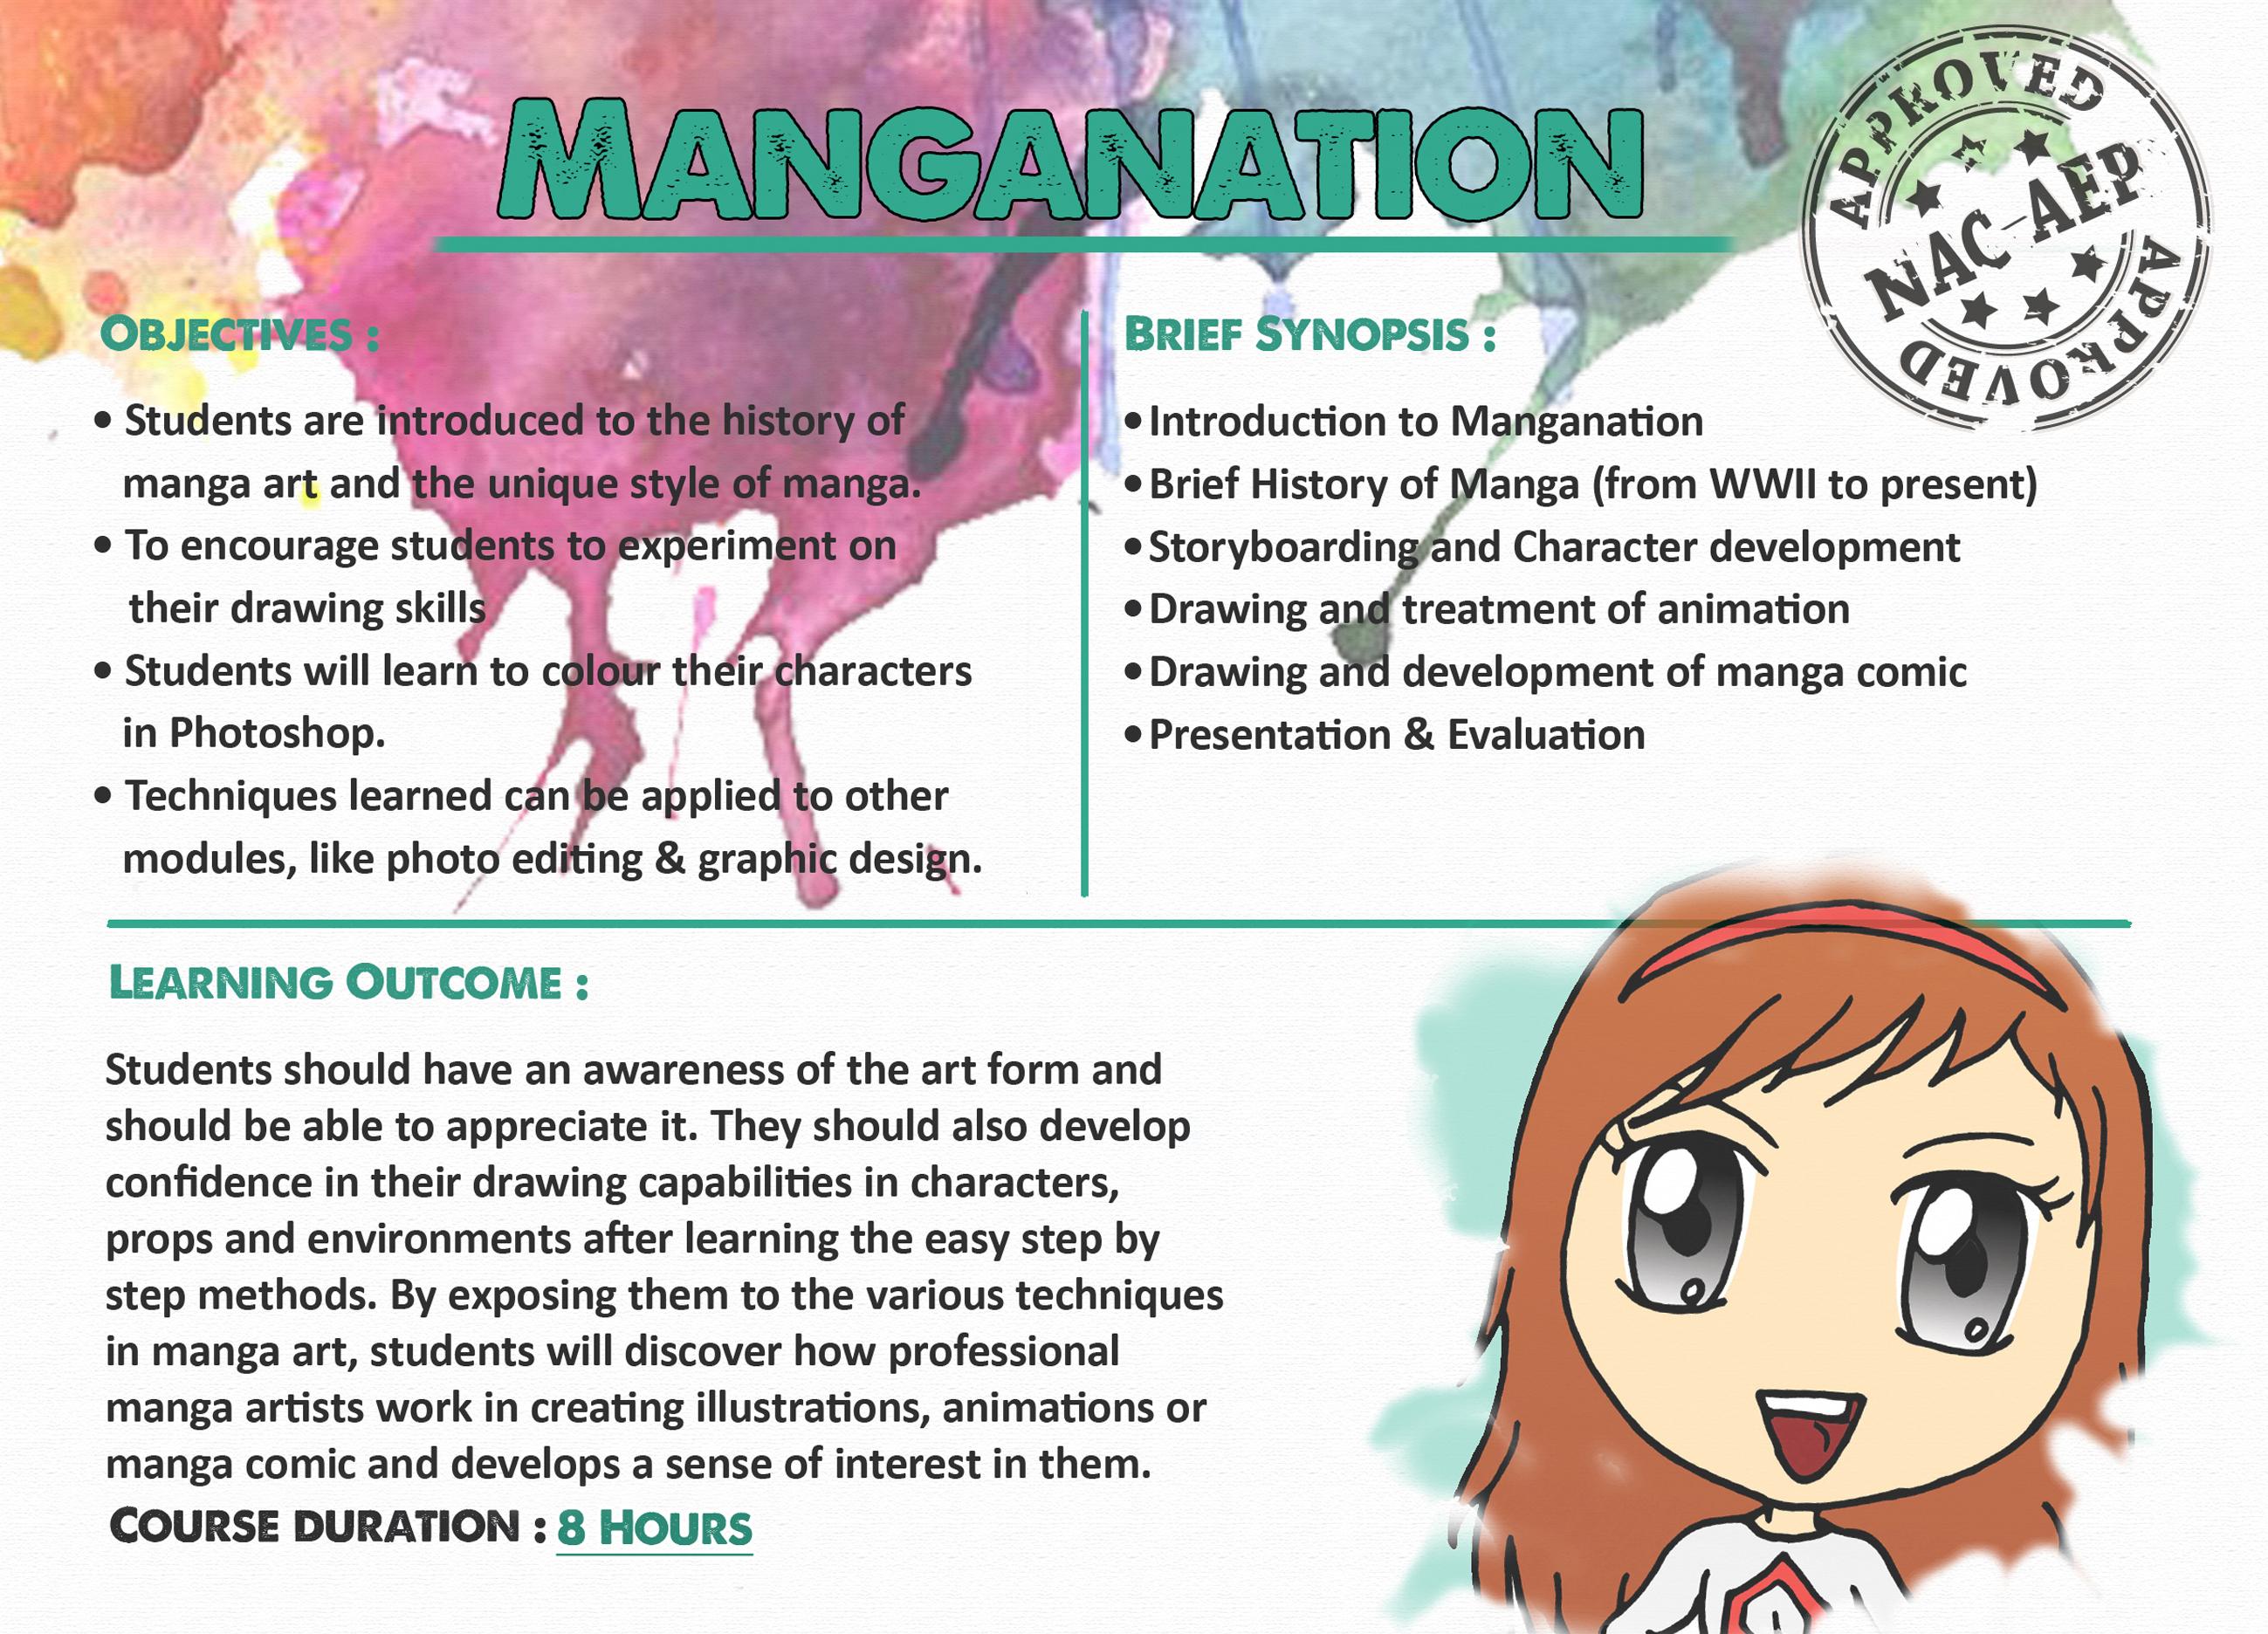 Manganation